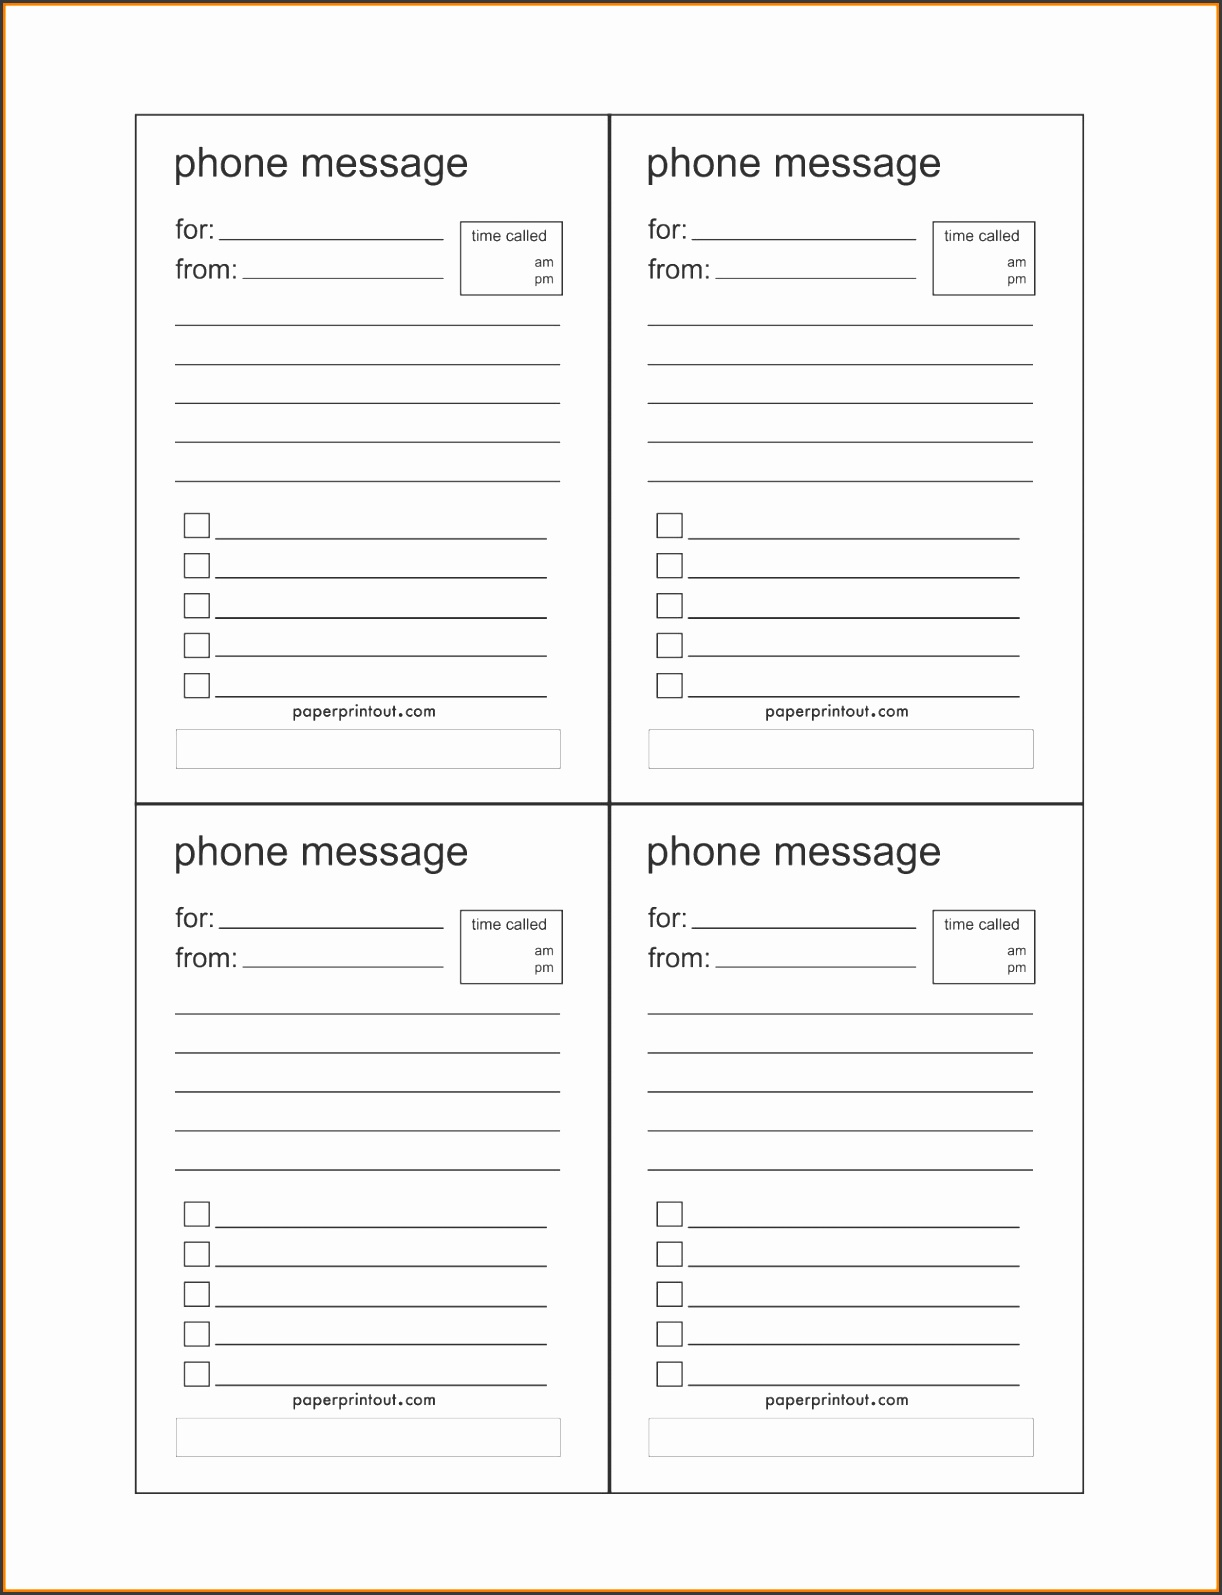 10 free rent receipt templates hloom 4 phone message template receipt templates gallery printable online calendar